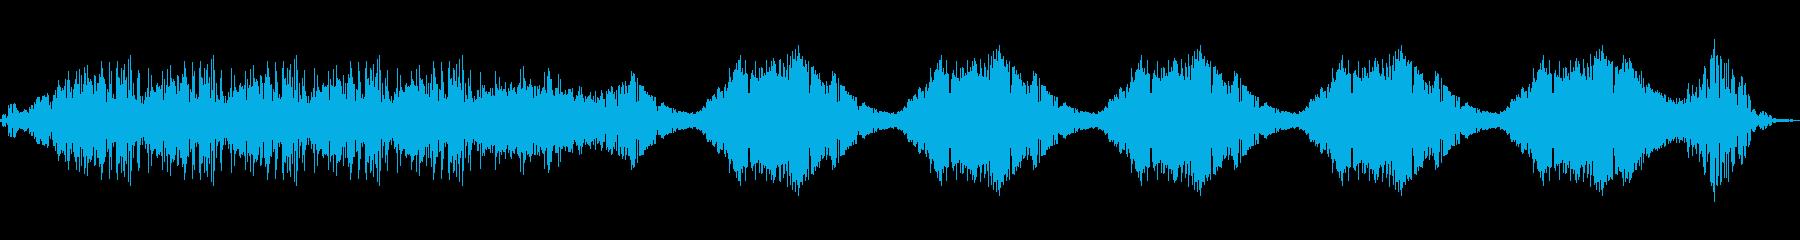 LOOPING BUBBLE GY...の再生済みの波形